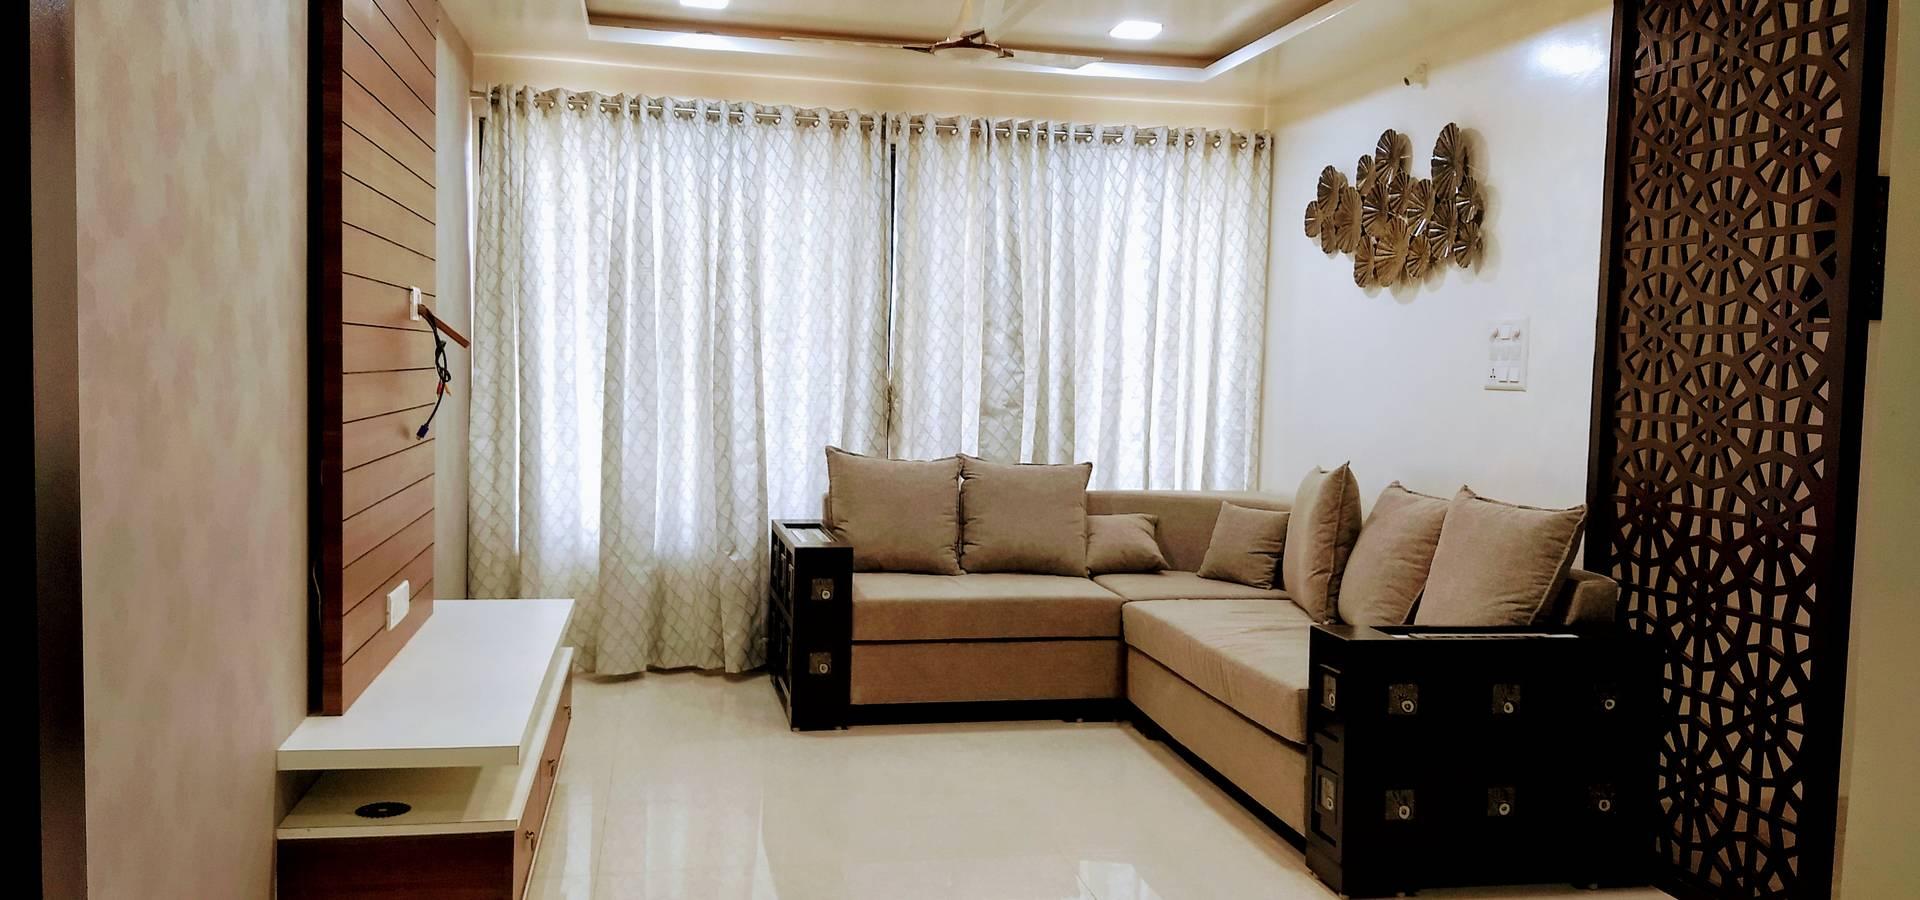 Sanrachna Interiors